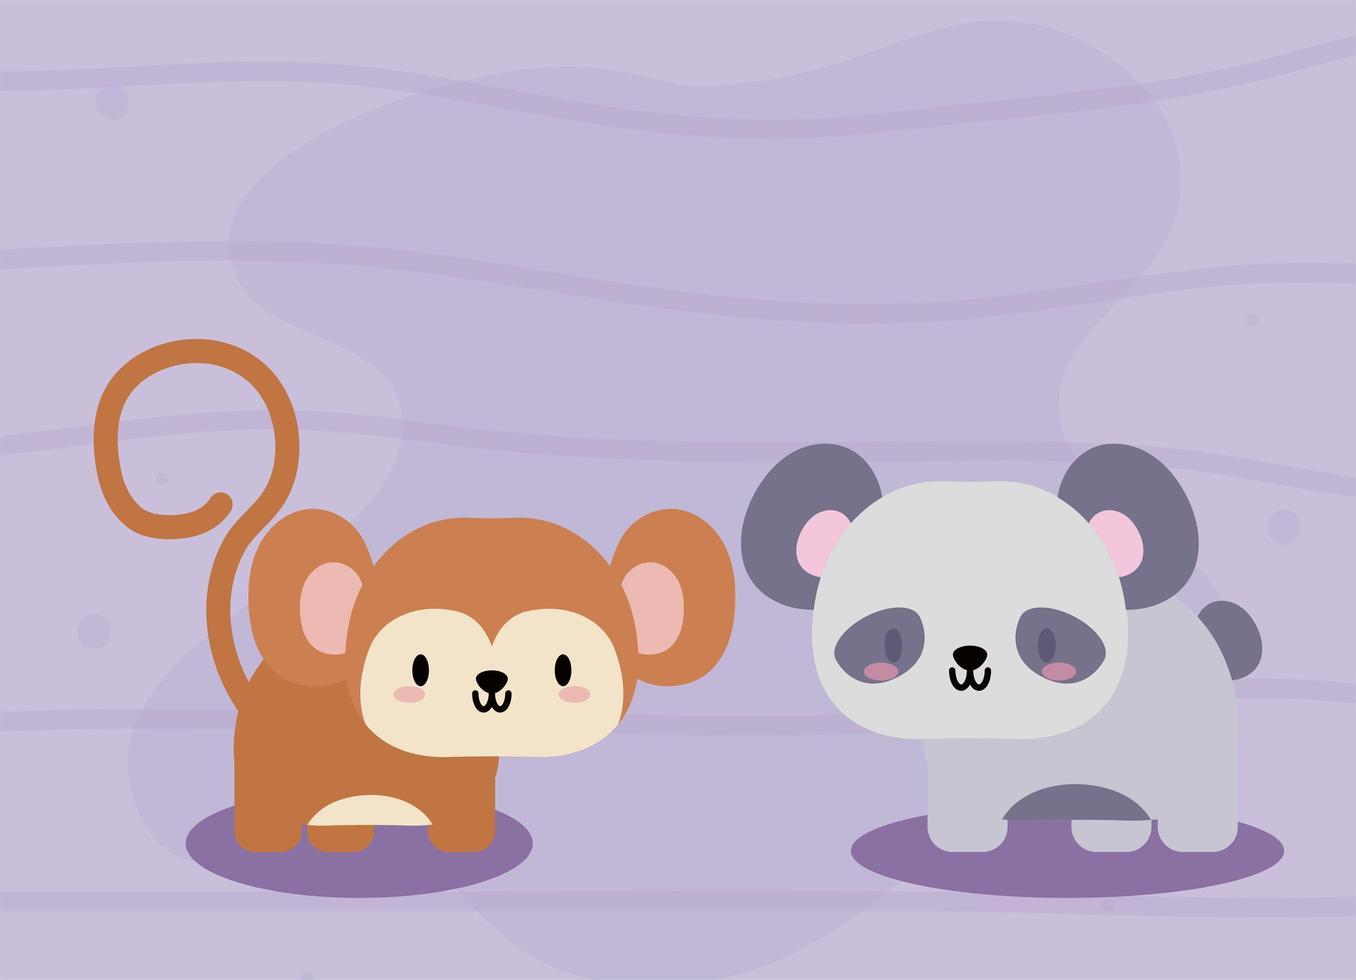 linda tarjeta con mono kawaii y oso panda vector